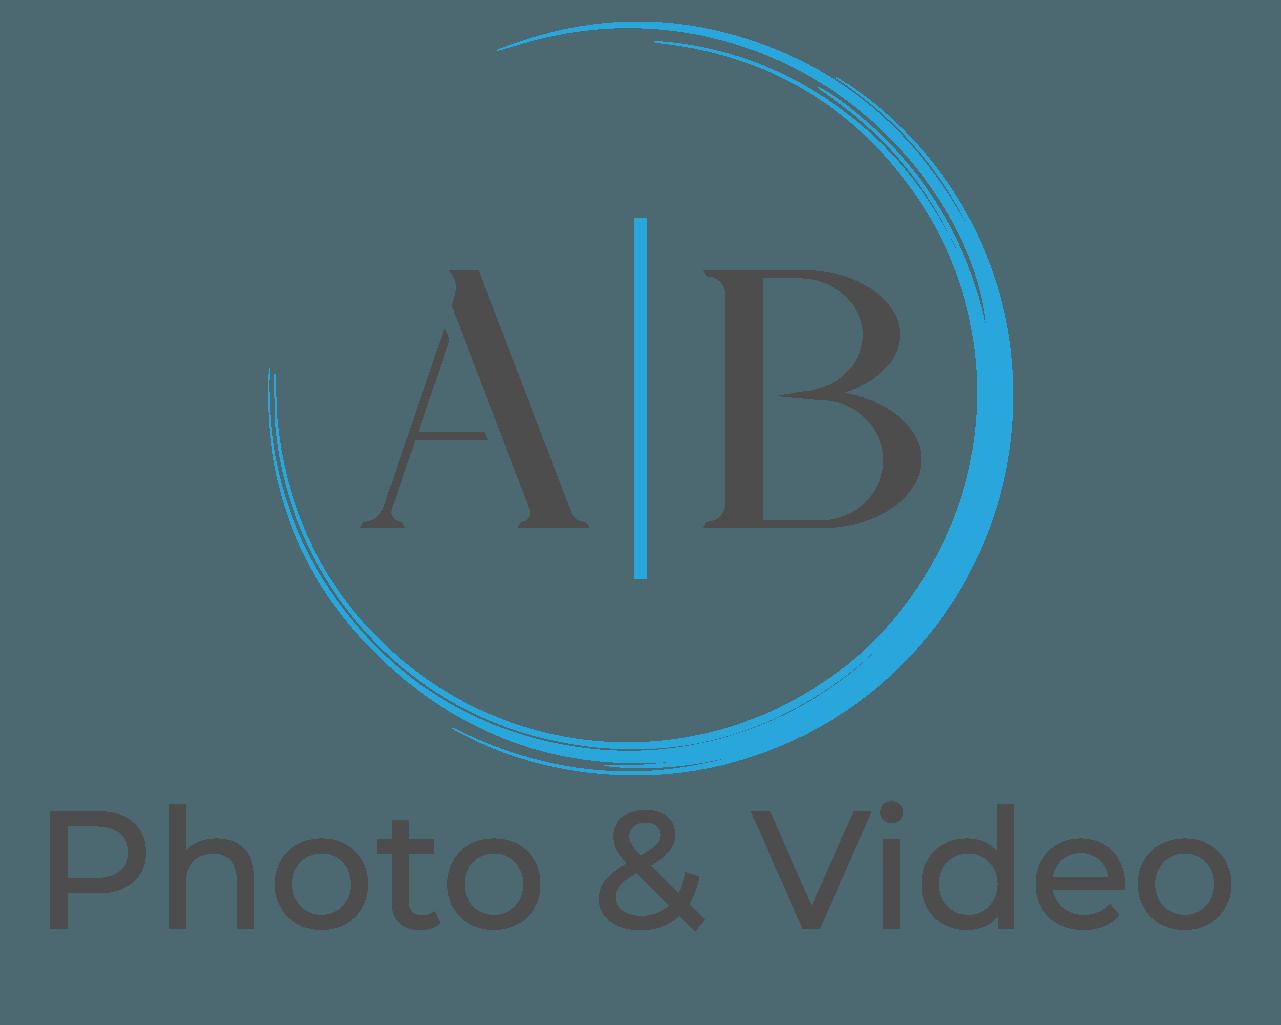 AB Photo & Video floor plan in Bellevue Seattle